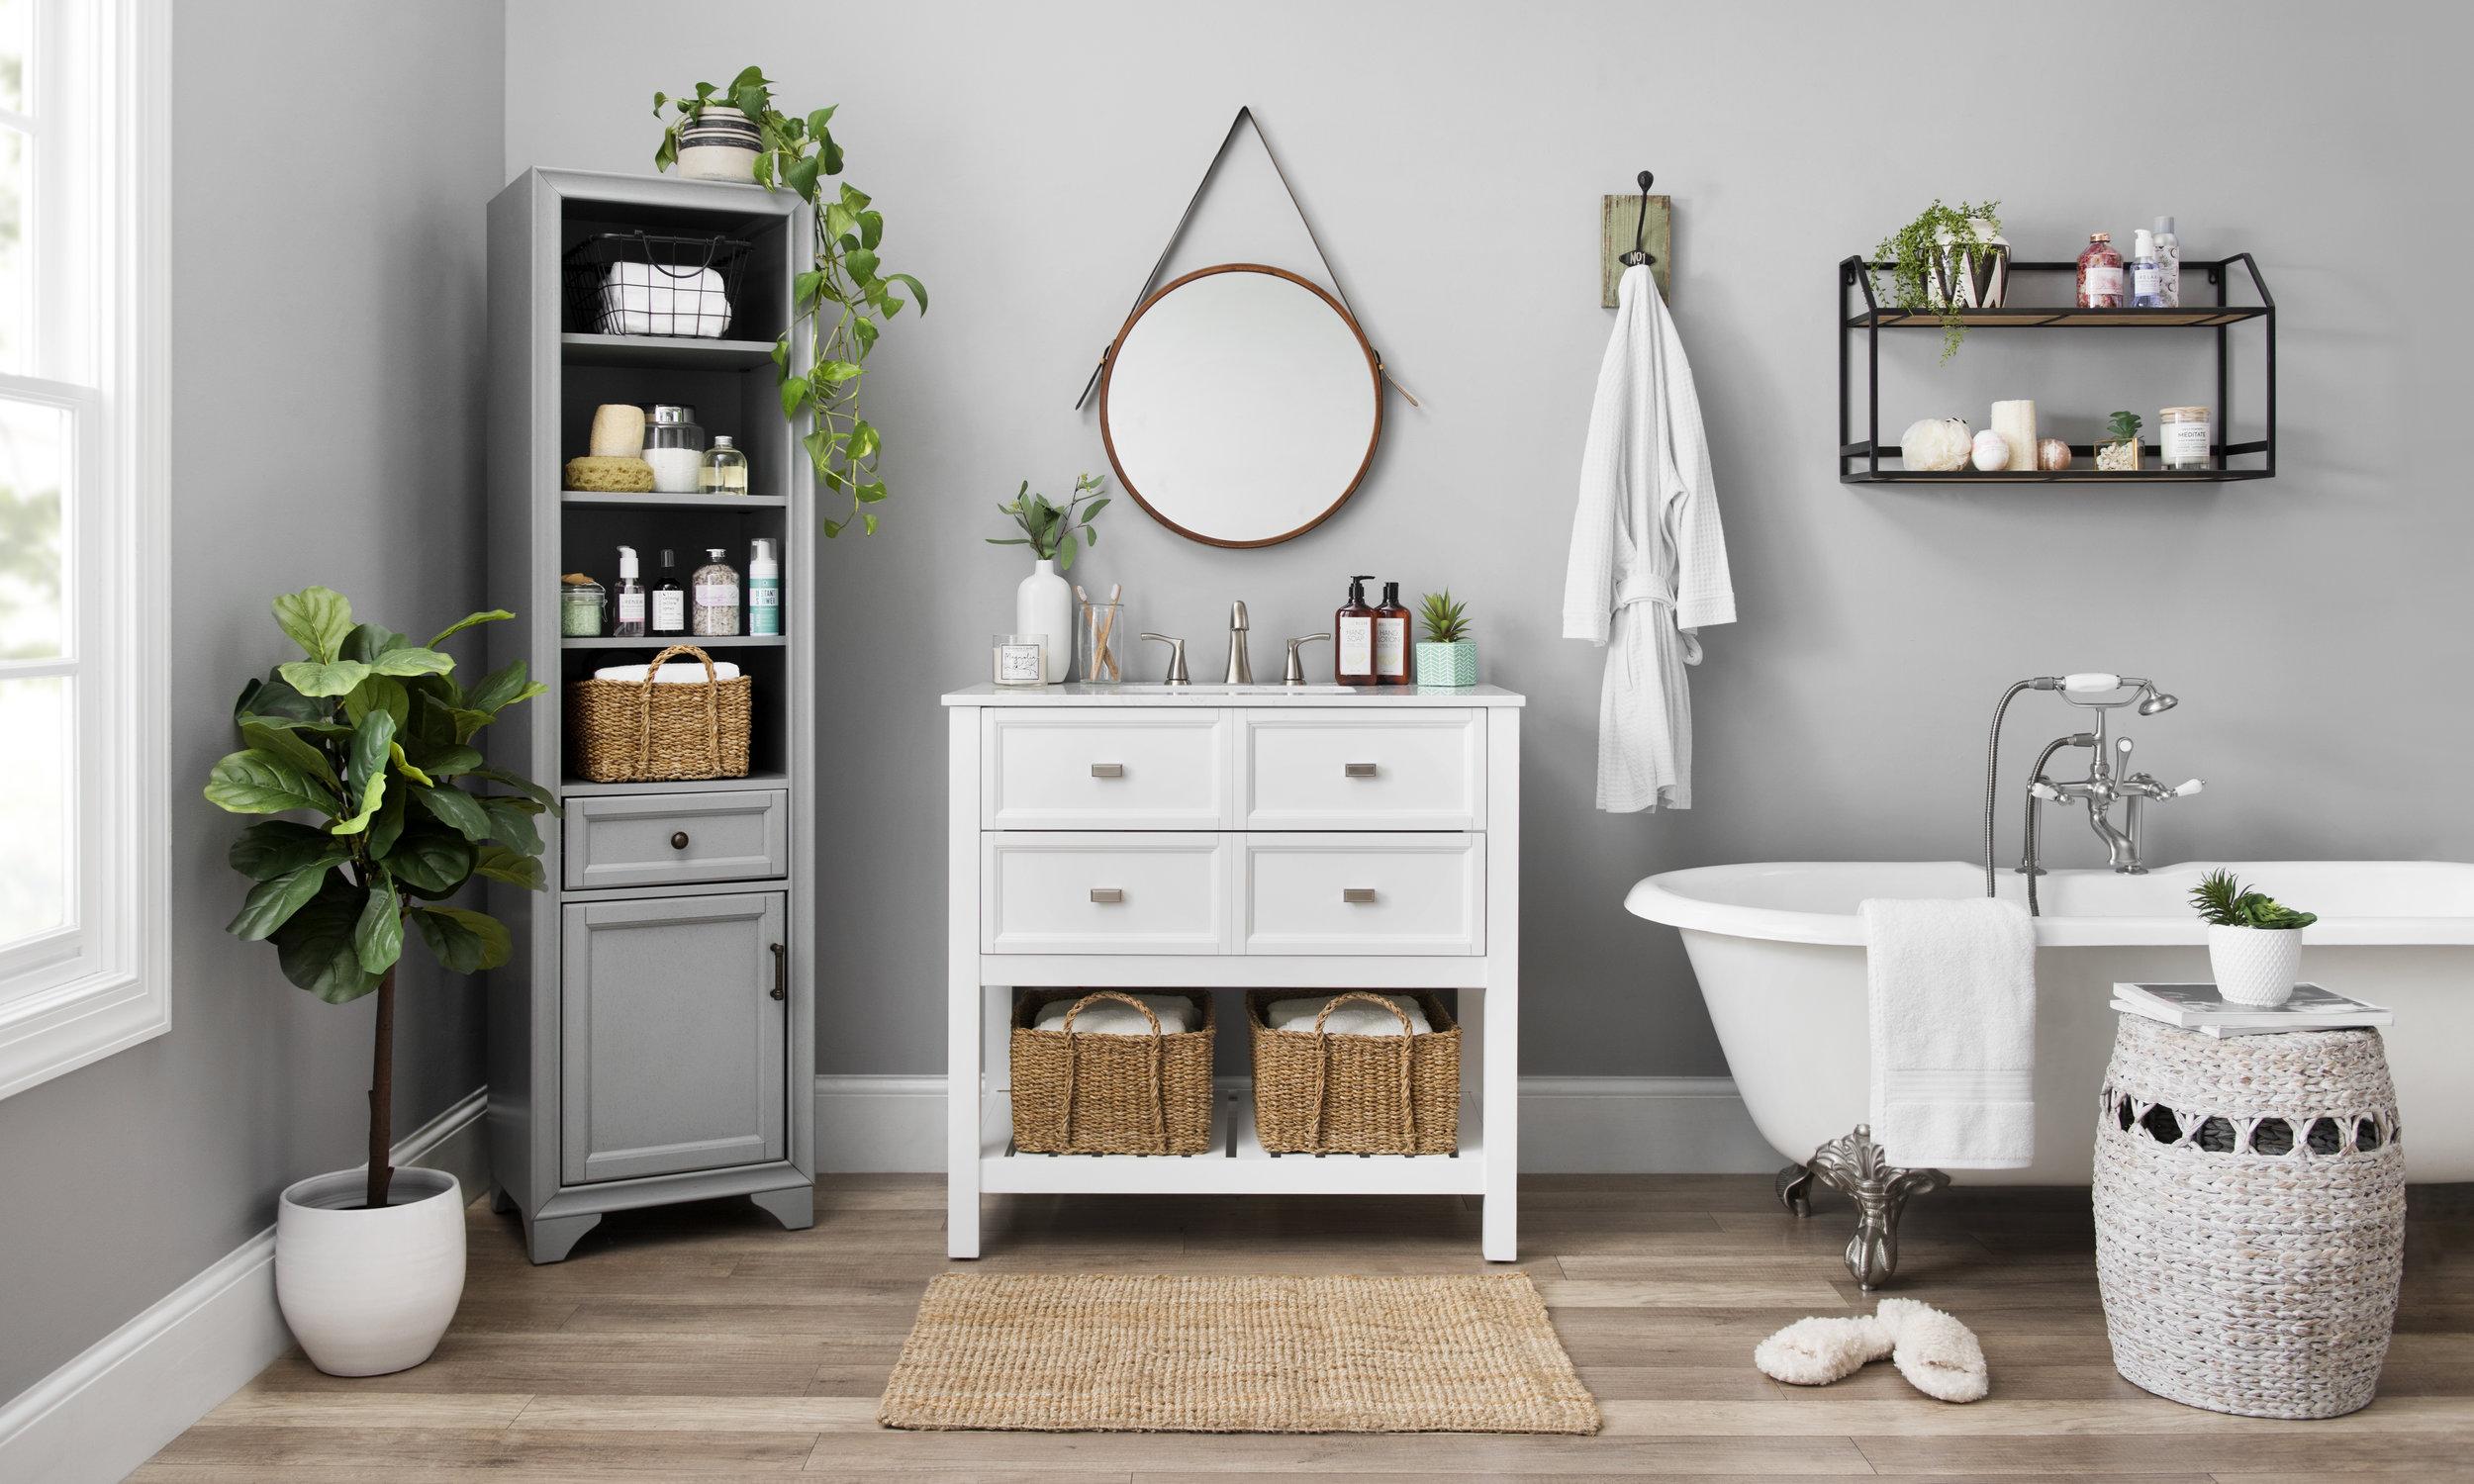 Kirkland's - Bathroom Organization